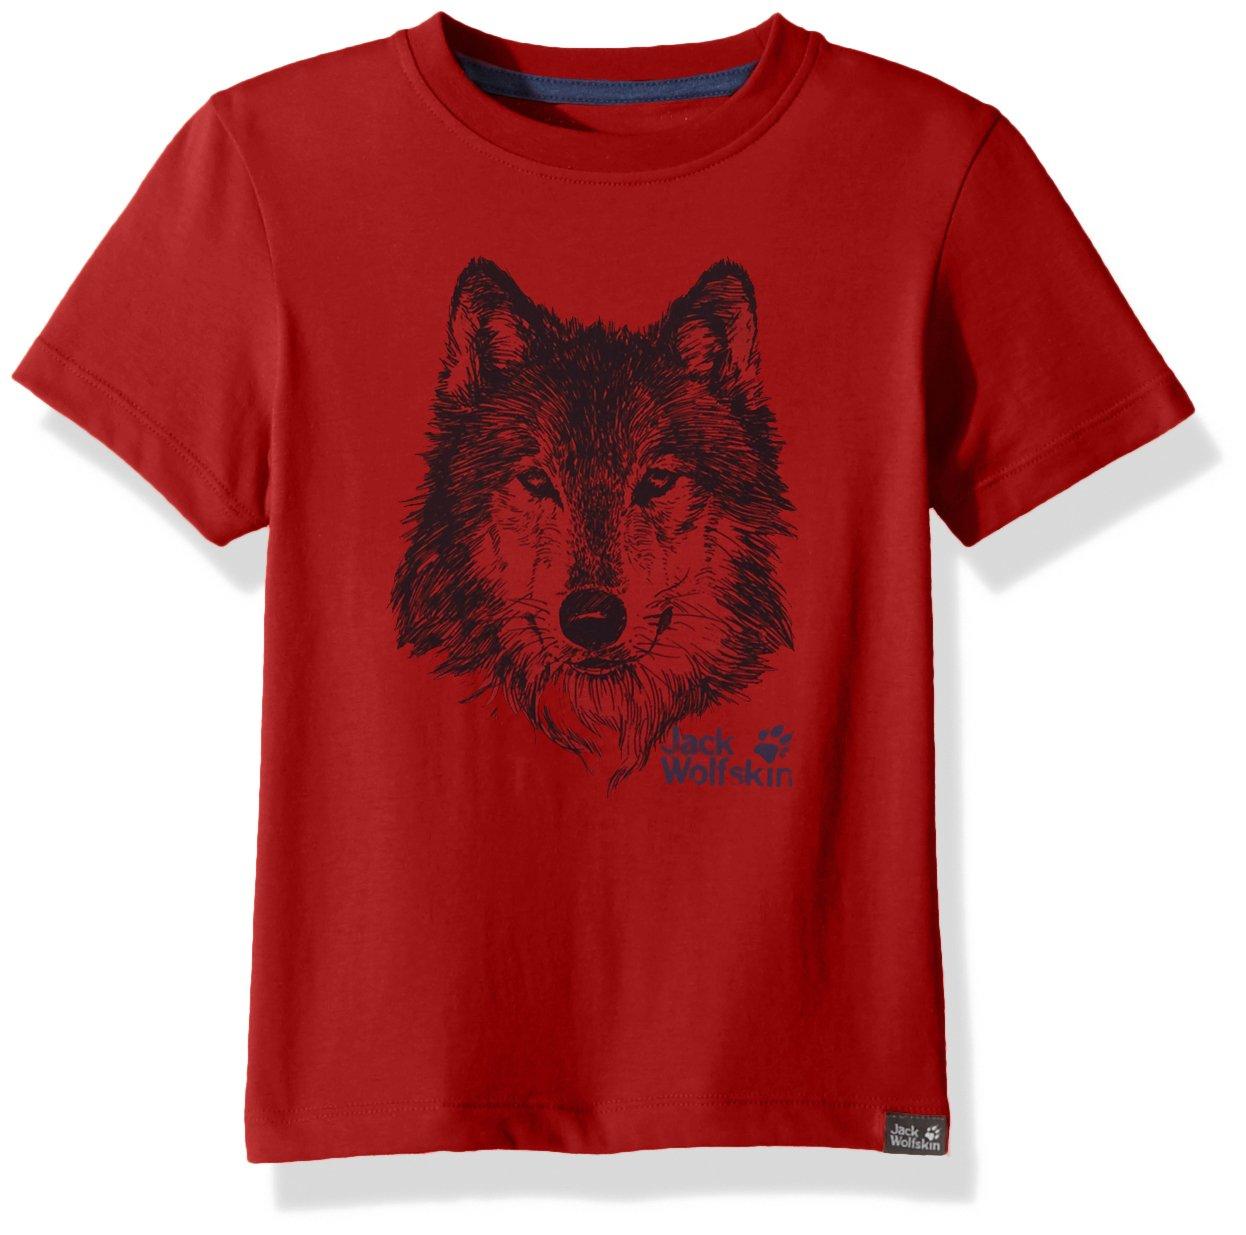 Jack Wolfskin Boy's Brand T T-Shirt Short Sleeve, 164 (13-14 Years Old), Peak Red by Jack Wolfskin